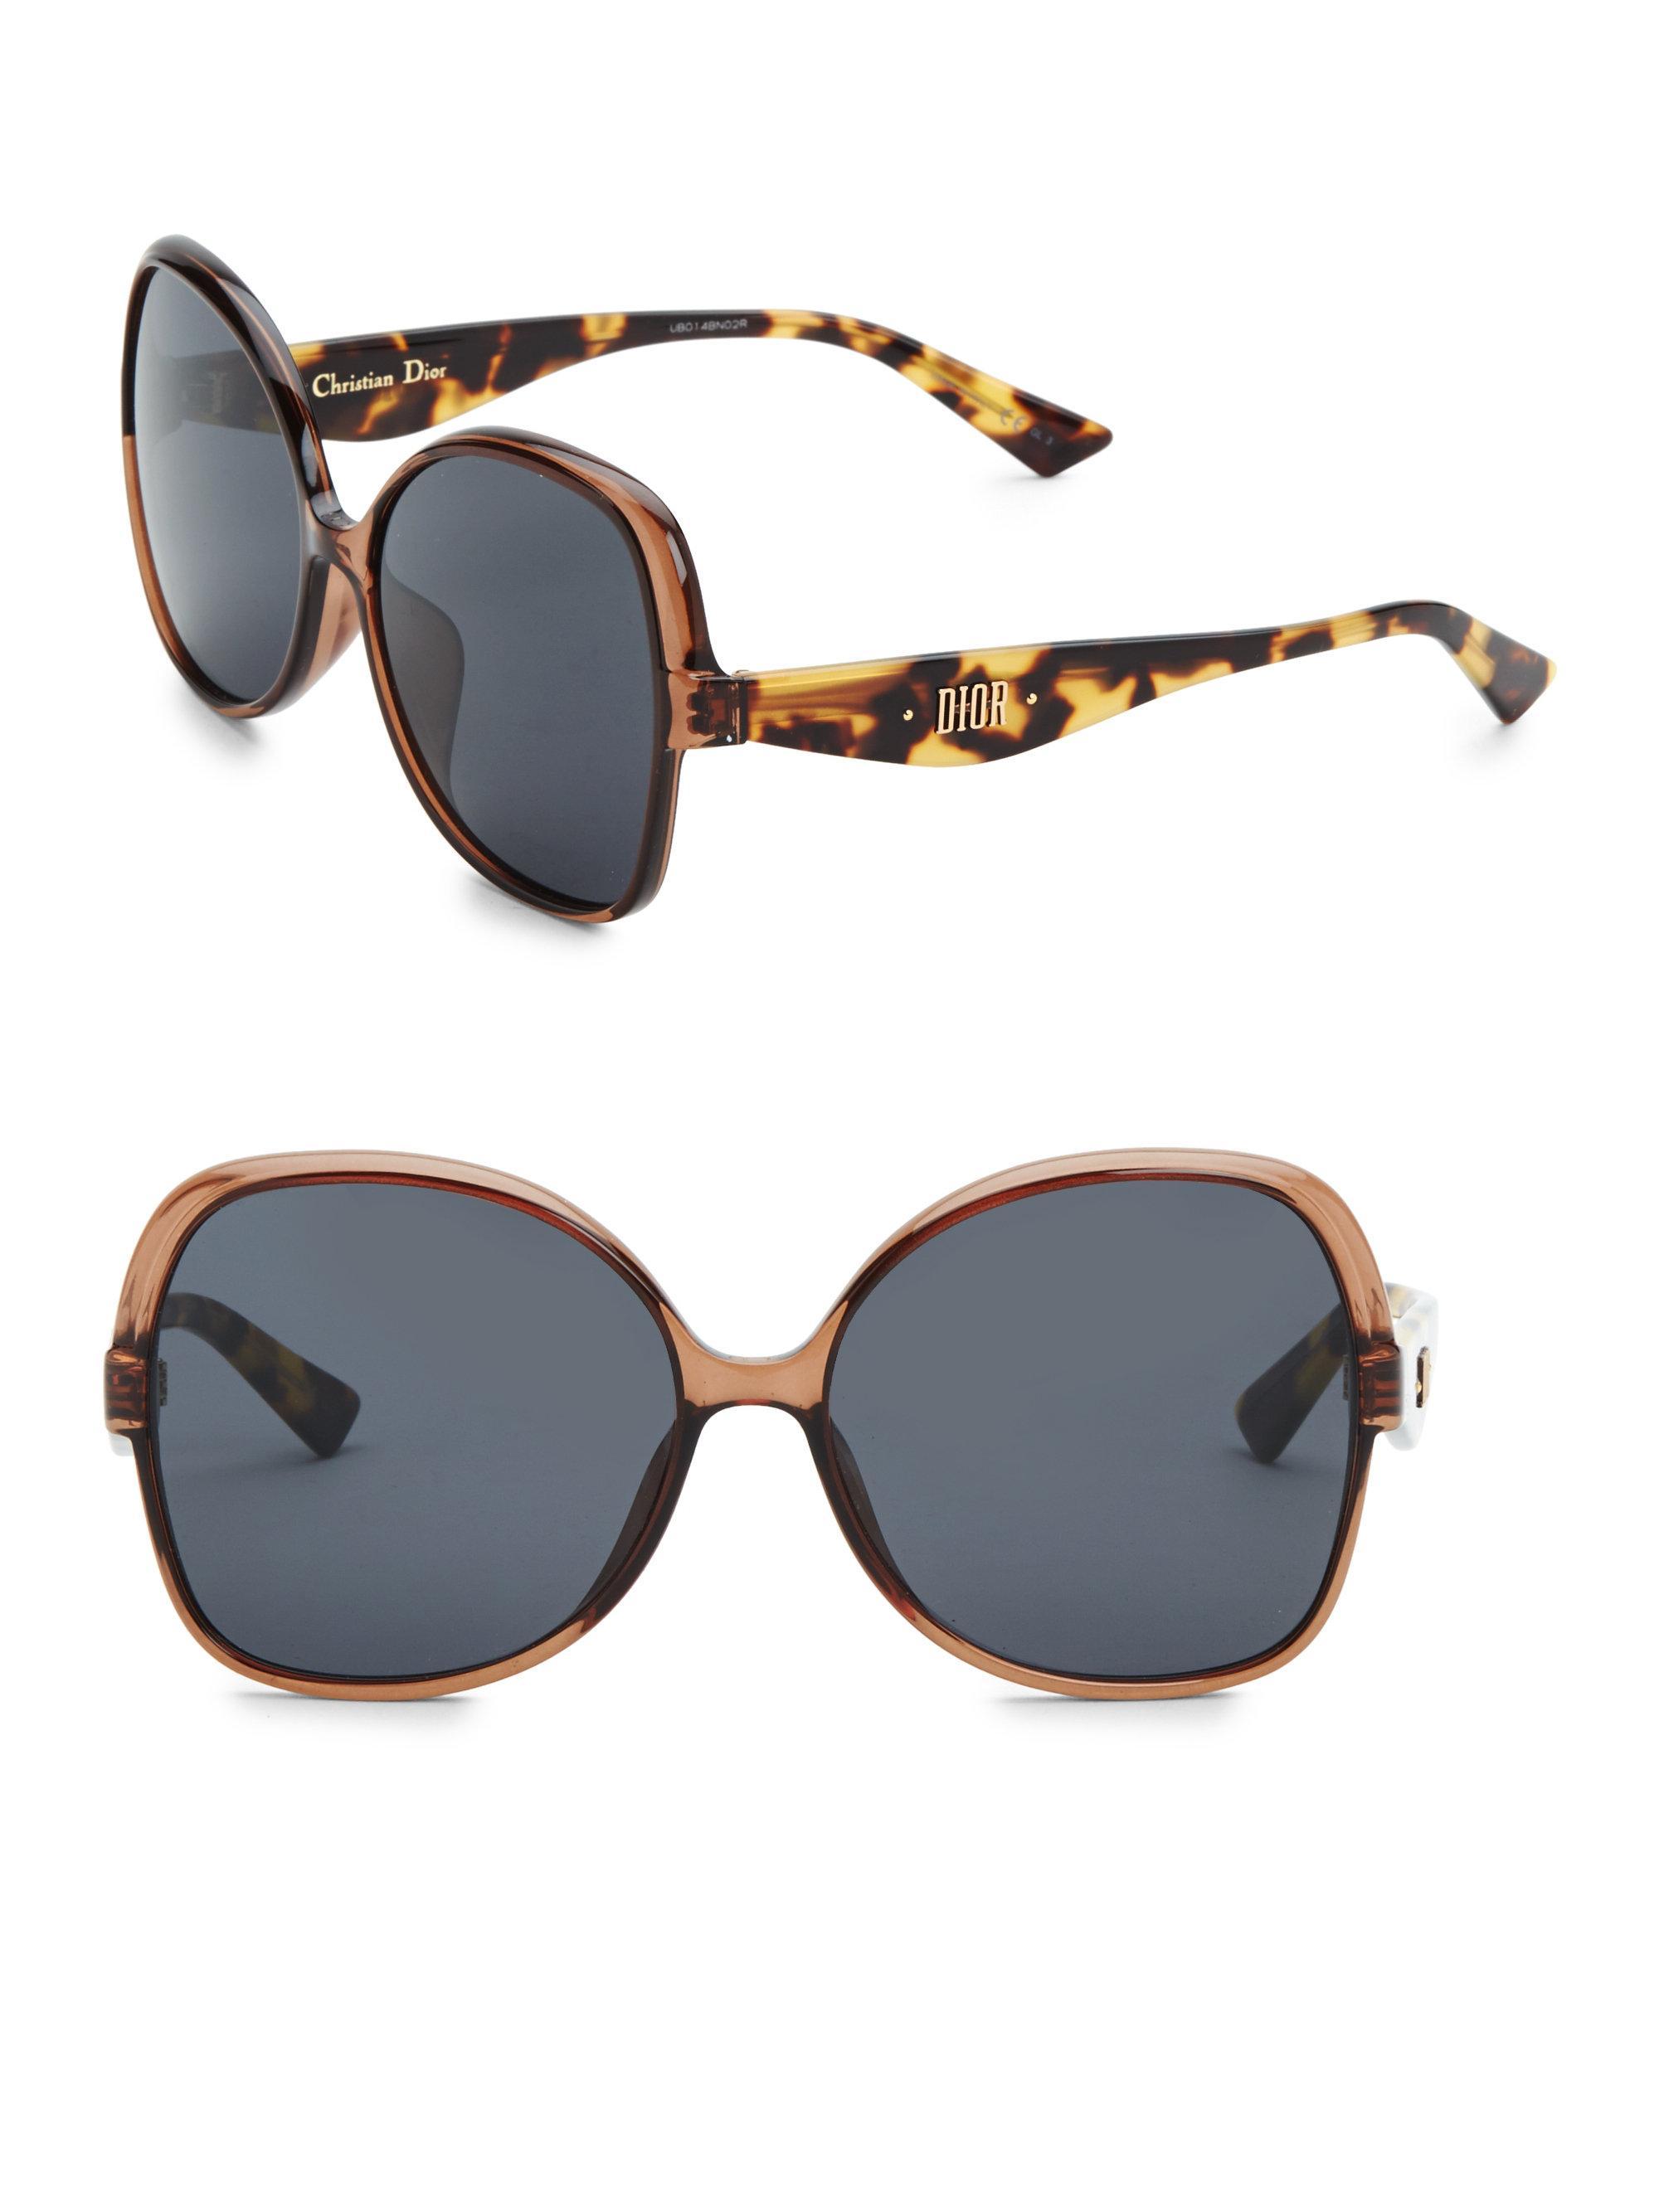 8d4ea5aeb4 Dior - Brown 60mm Nuance Square Sunglasses - Lyst. View fullscreen